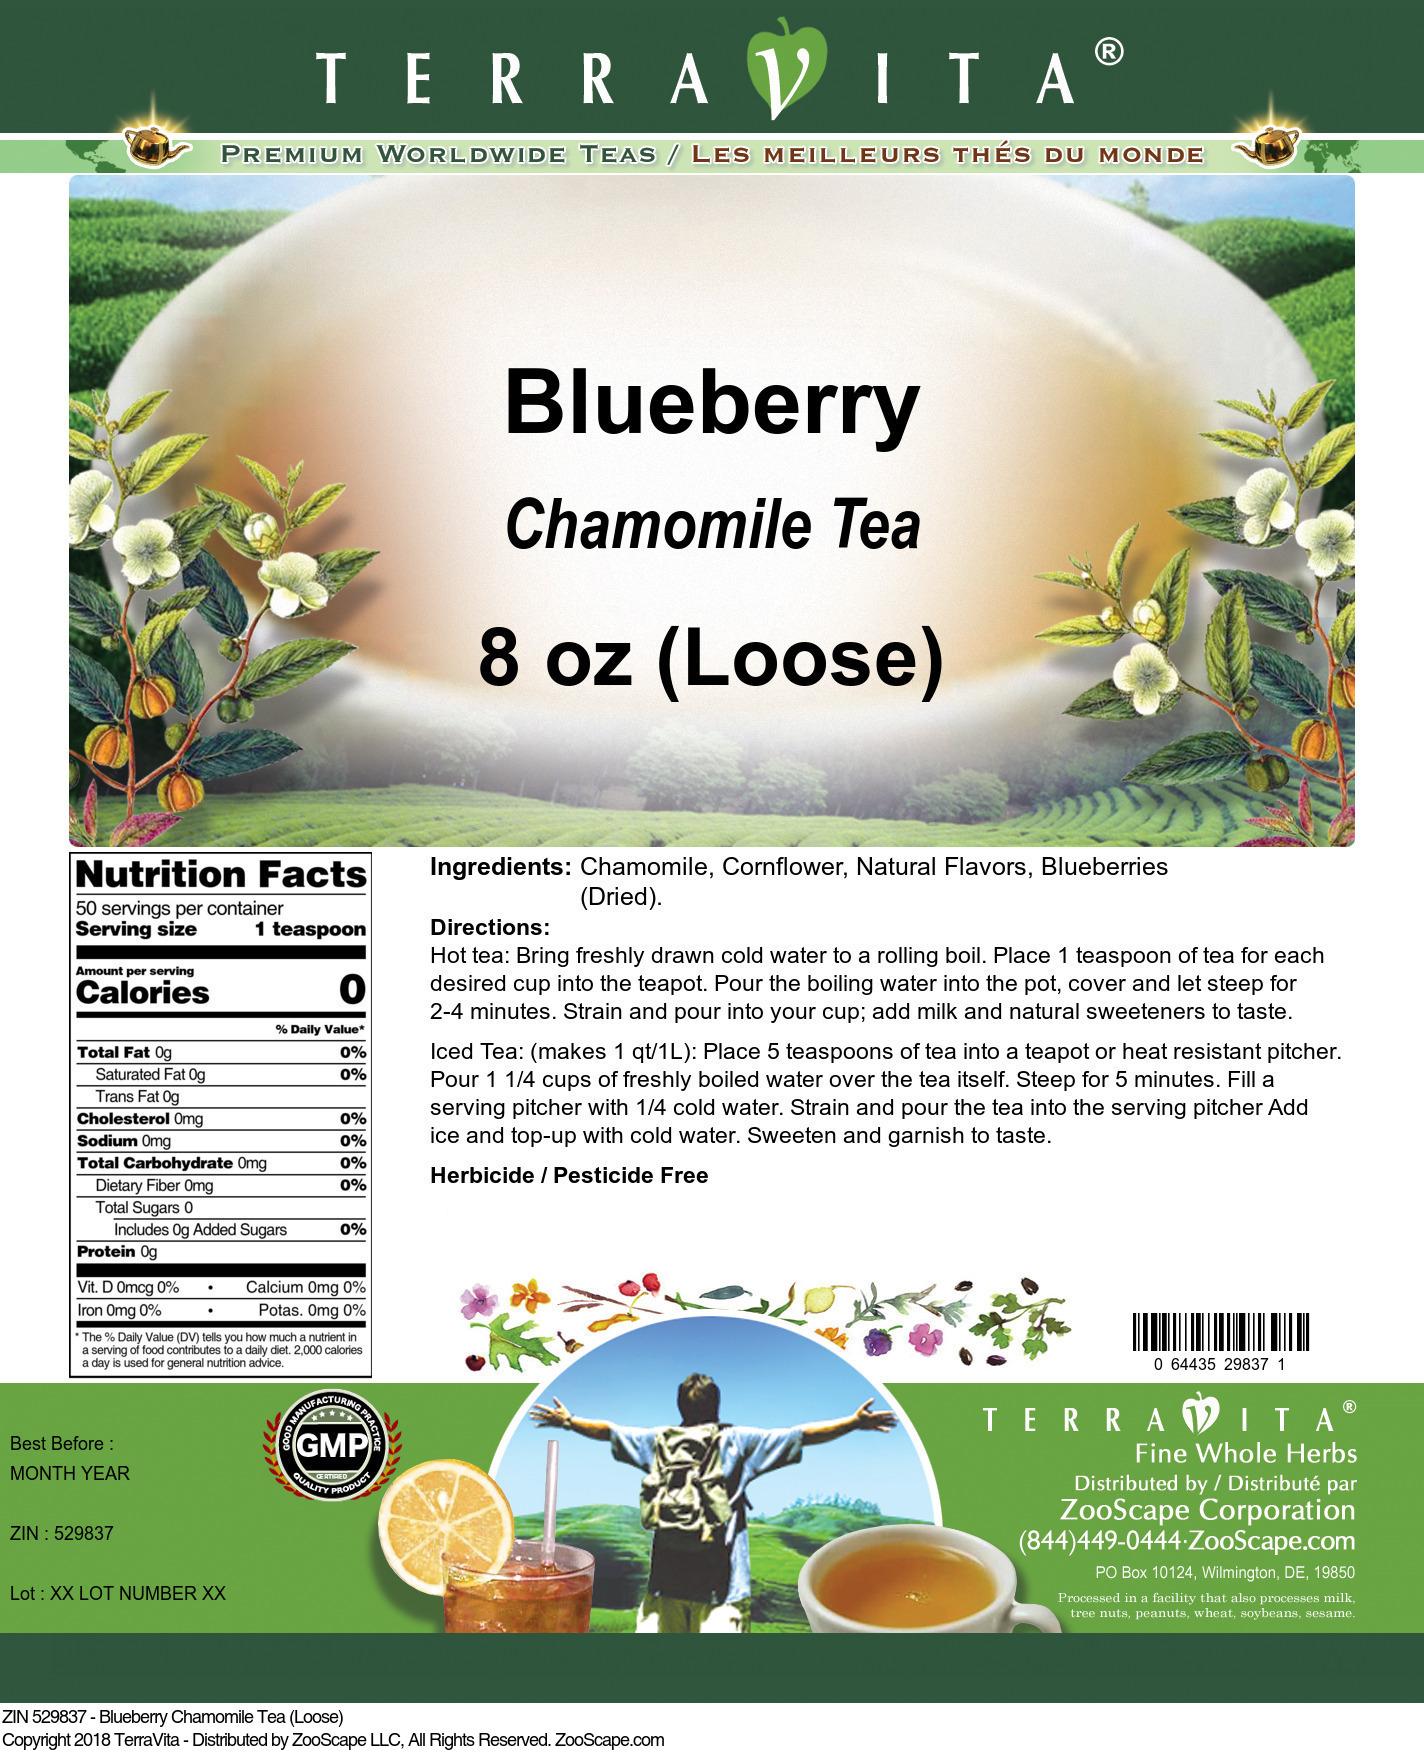 Blueberry Chamomile Tea (Loose)